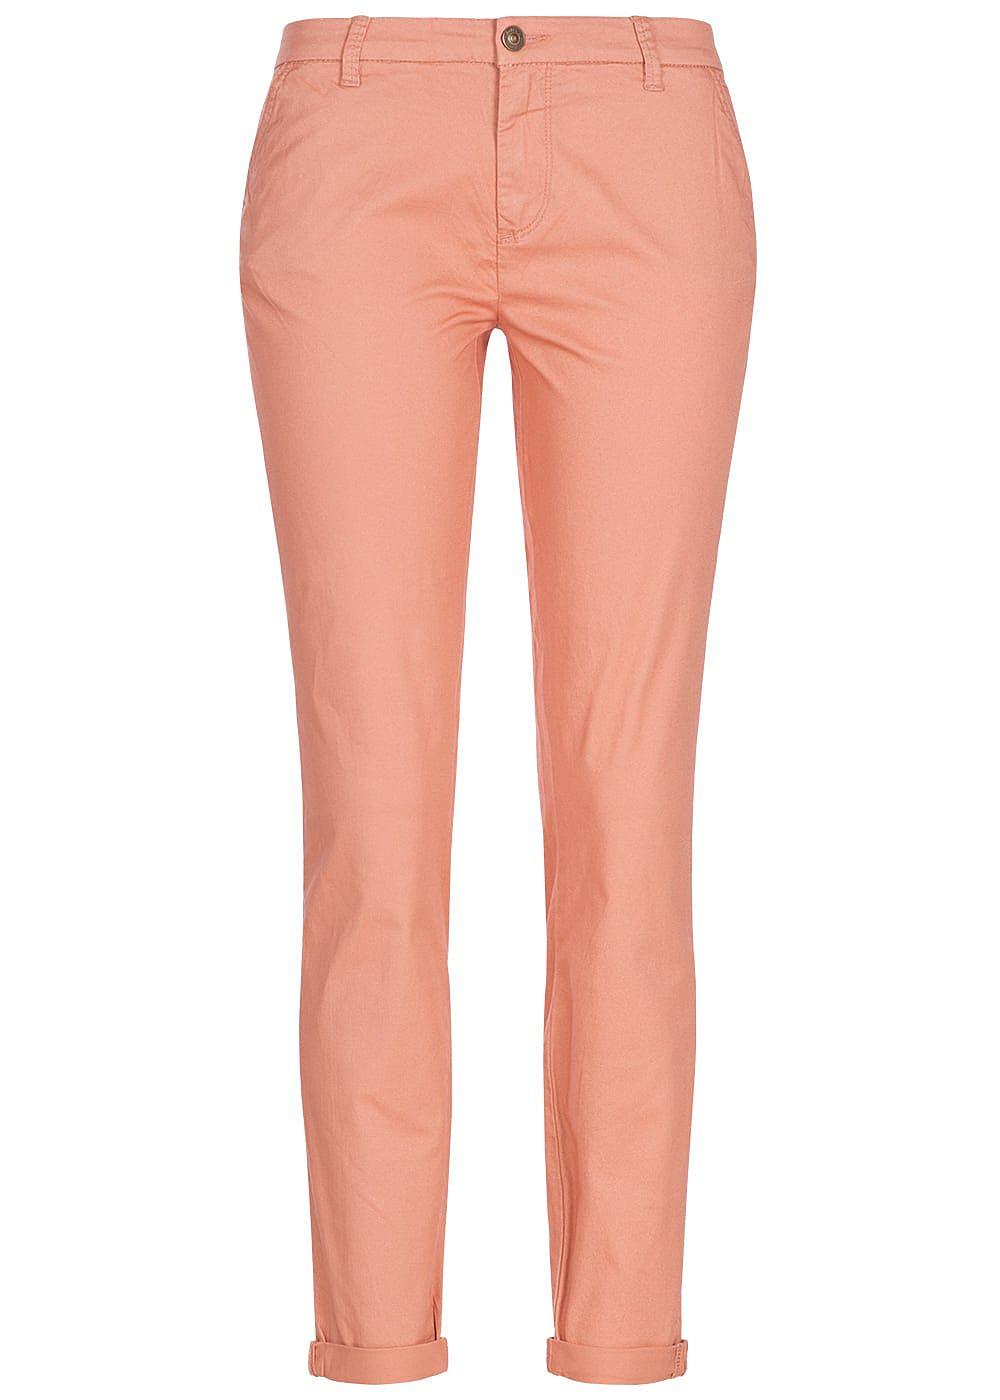 c7ffe5ad62120d ONLY Damen Skinny Chino Hose 4-Pockets Beinumschlag NOOS dawn rosa ...